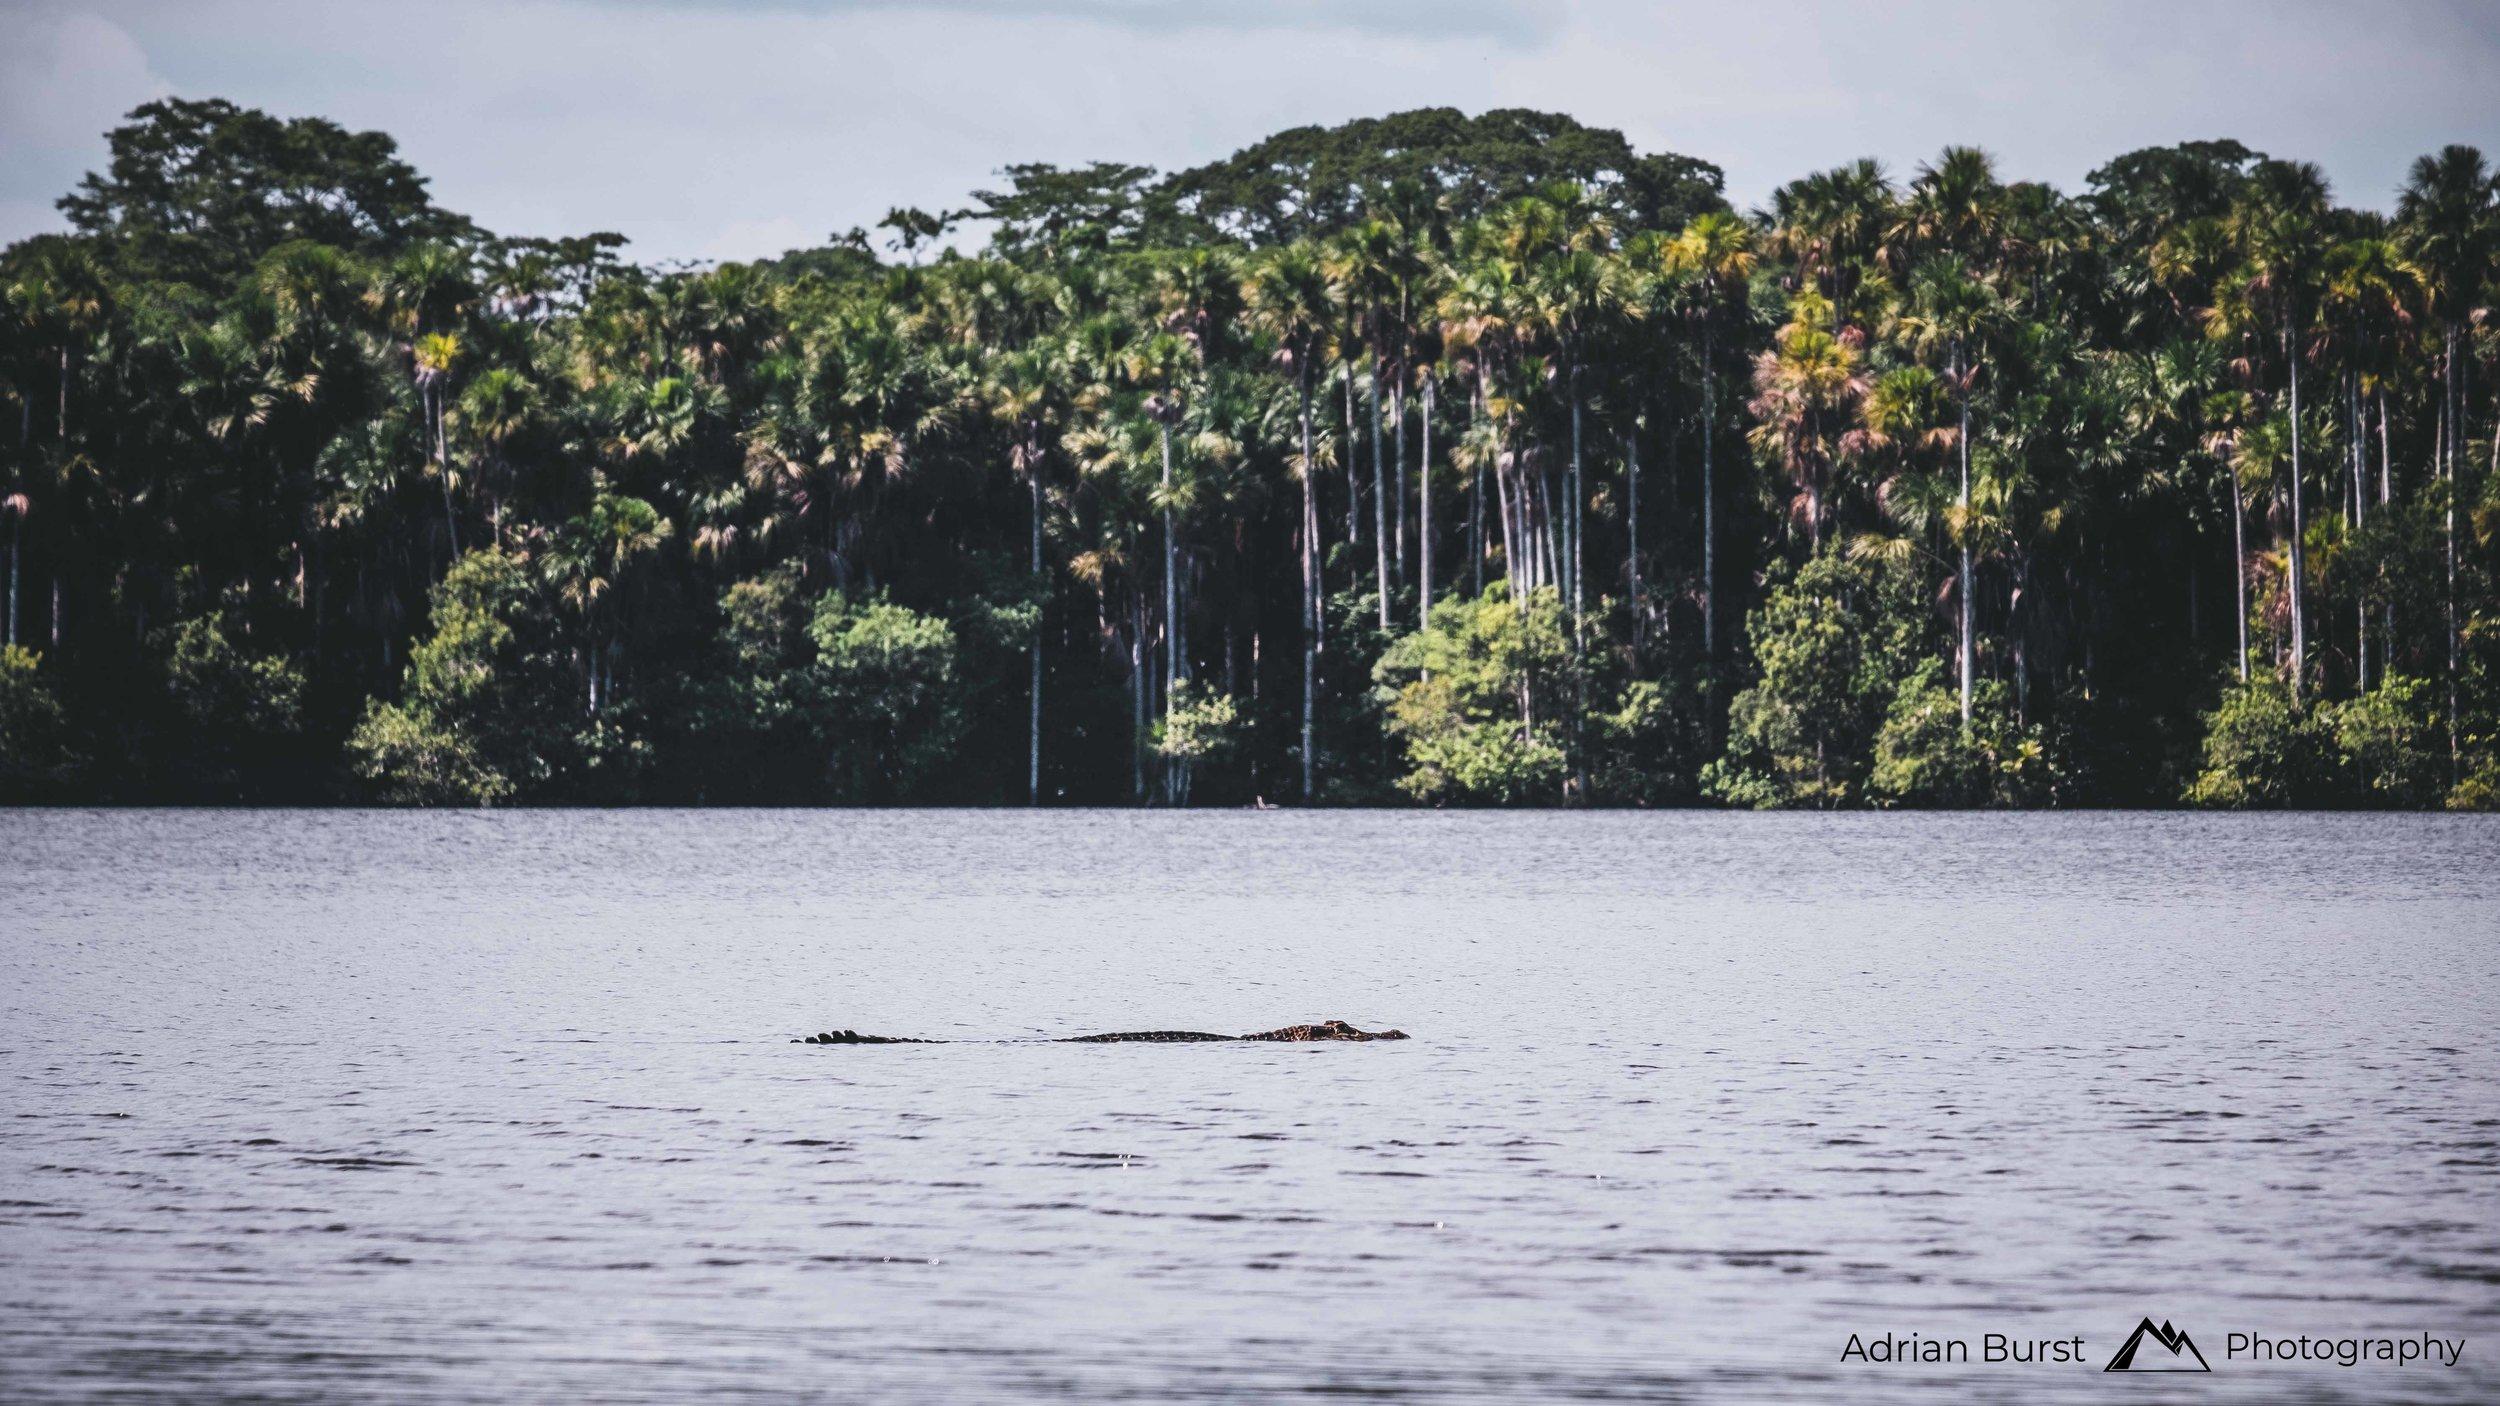 154 | Lake Sandoval, Tambopata national reserve